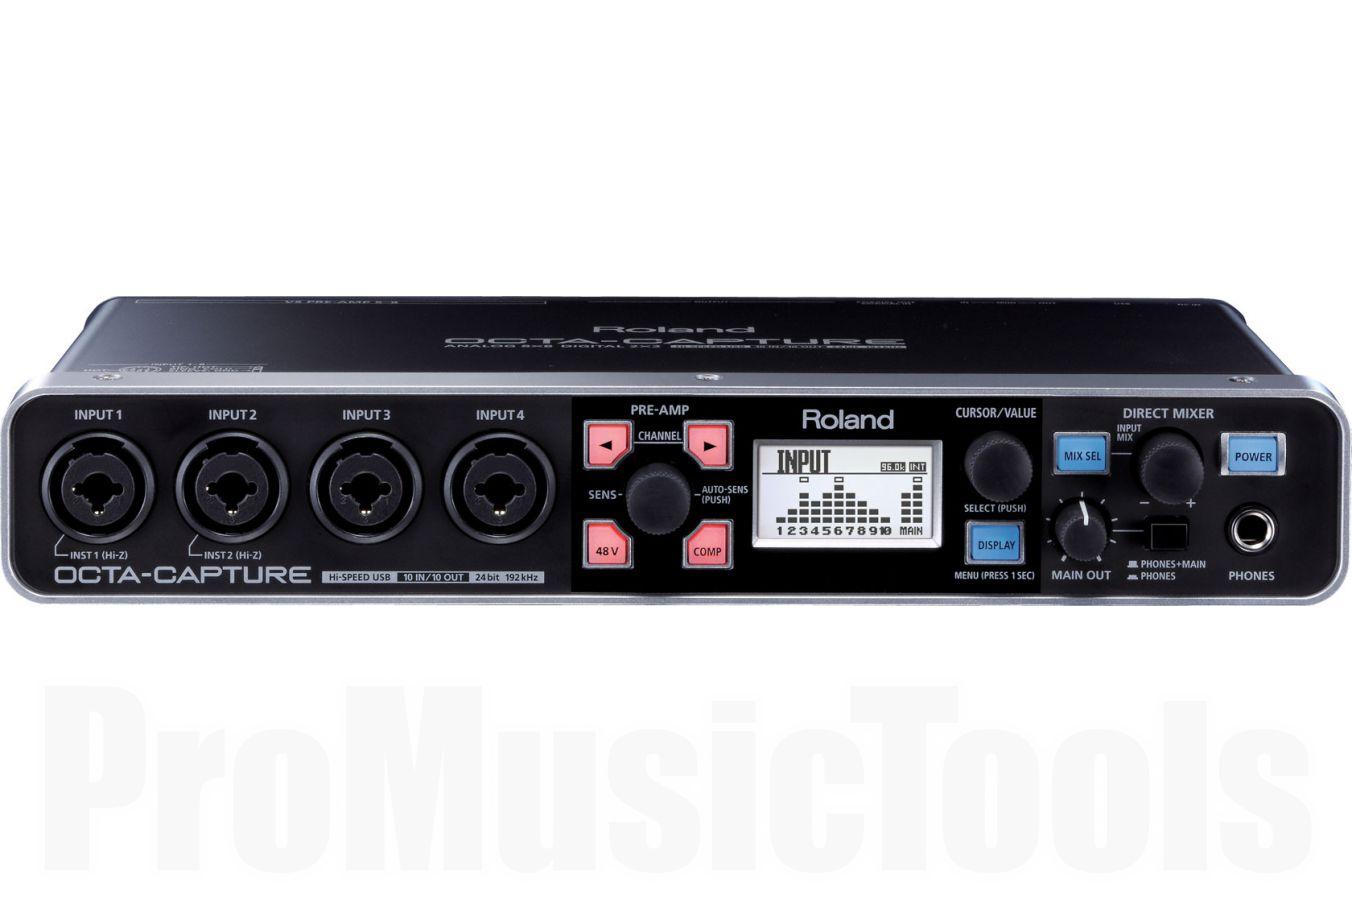 Roland UA-1010 Octa-Capture - 10x10 USB Audio Interface